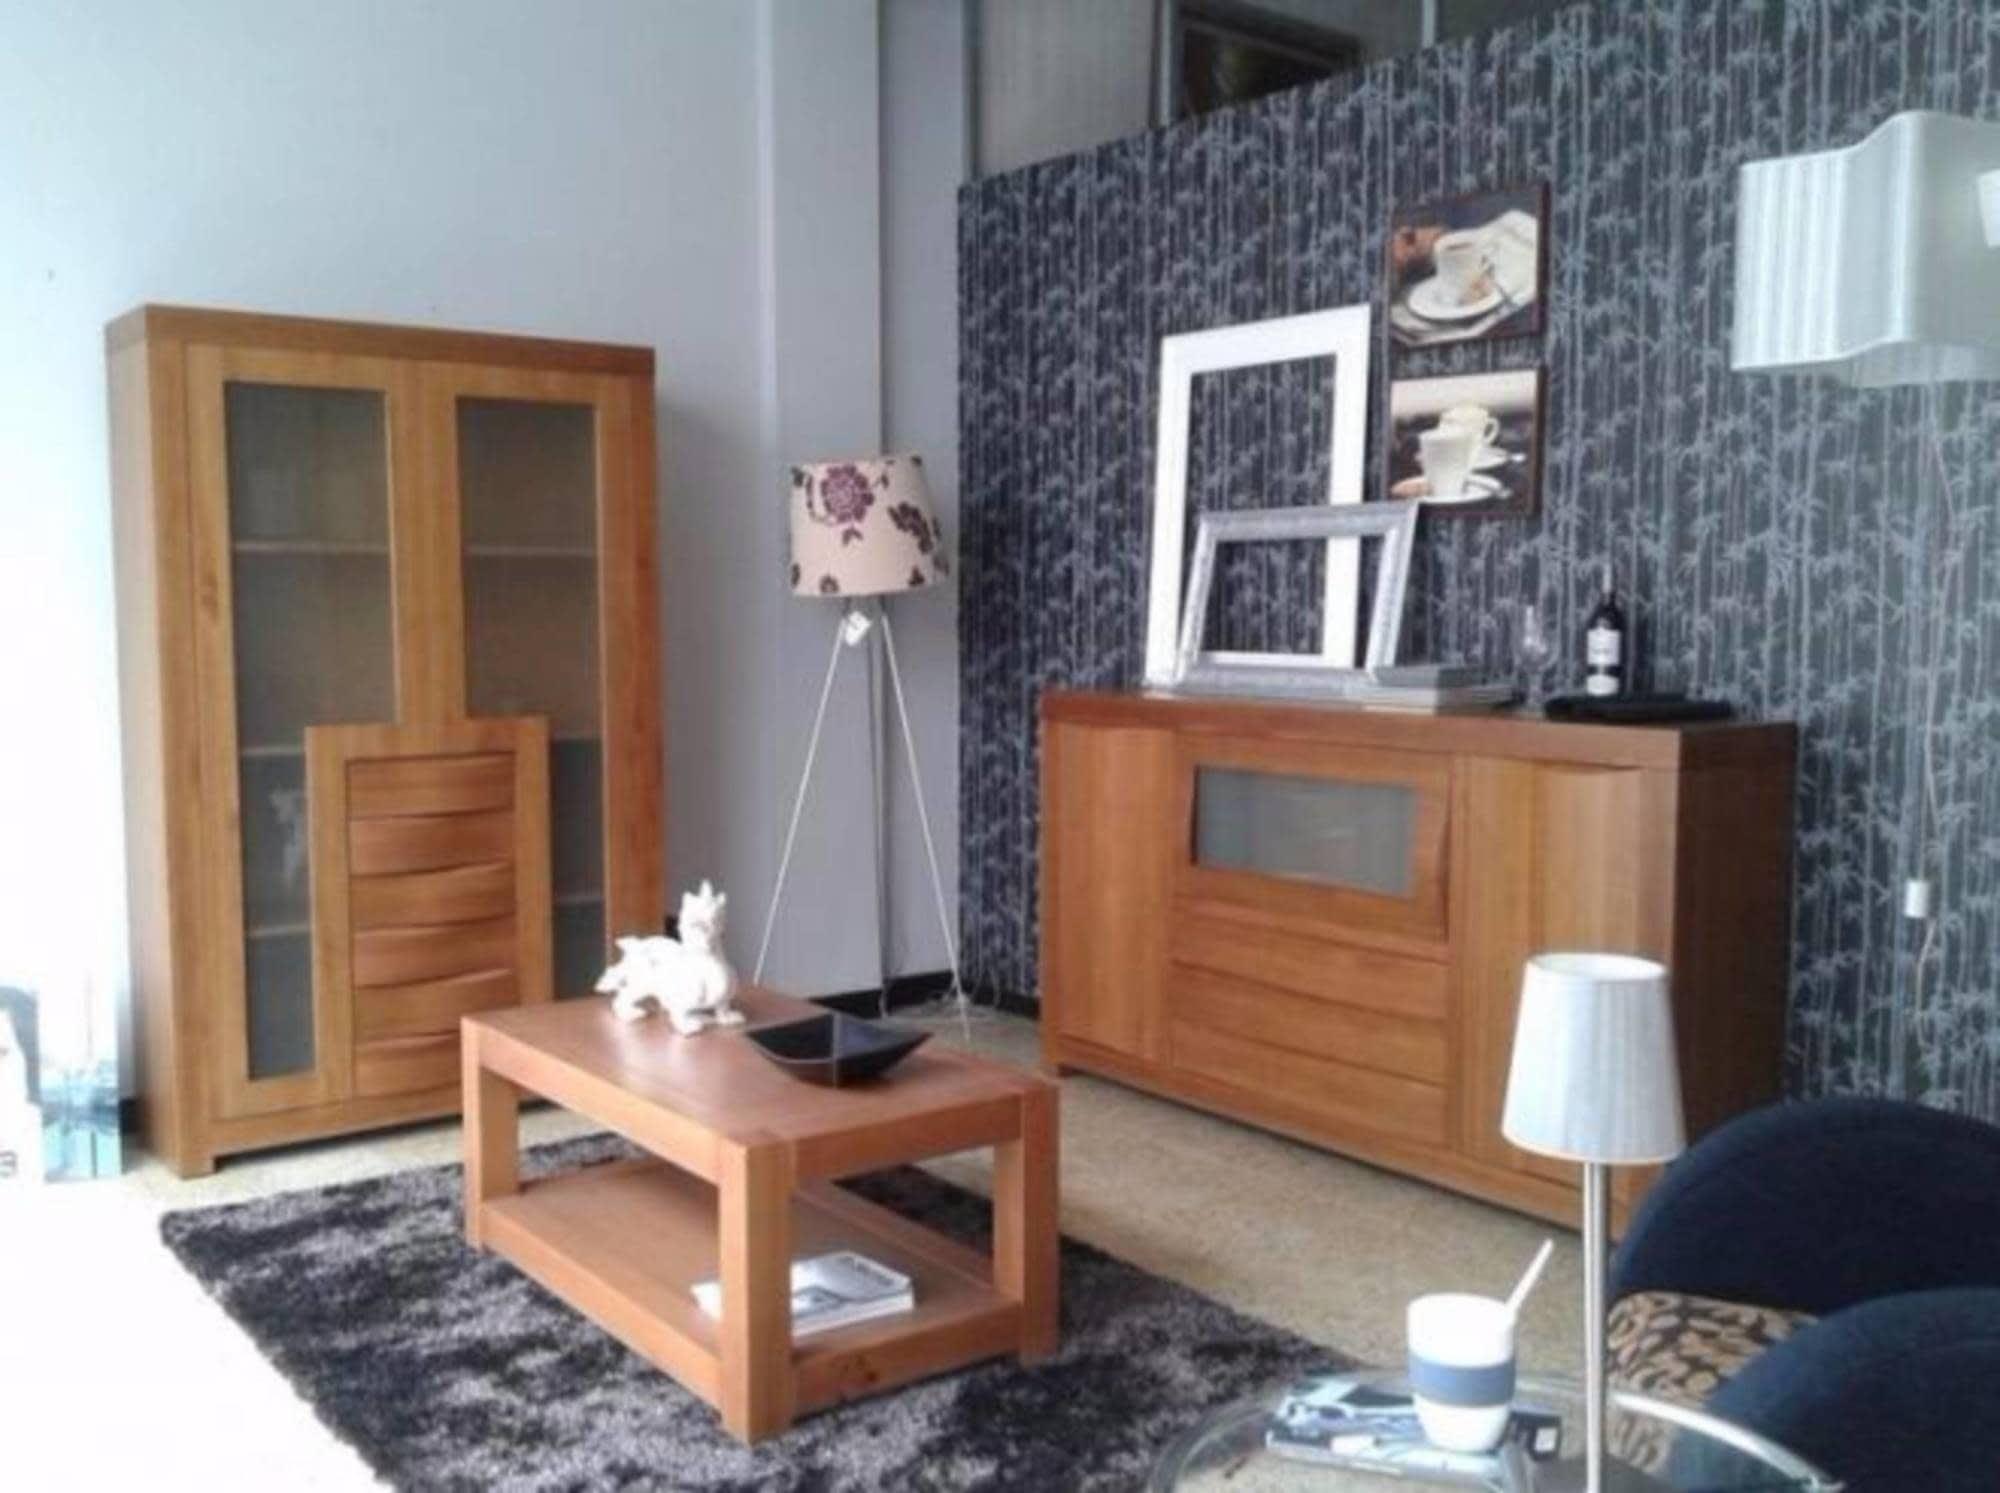 Muebles Rivas Fene - Galeria Muebles Rivas Tienda De Muebles En Fene[mjhdah]https://www.paxinasgalegas.es/imagenes/muebles-rivas_img119351n14t2m0w1024h768.jpg